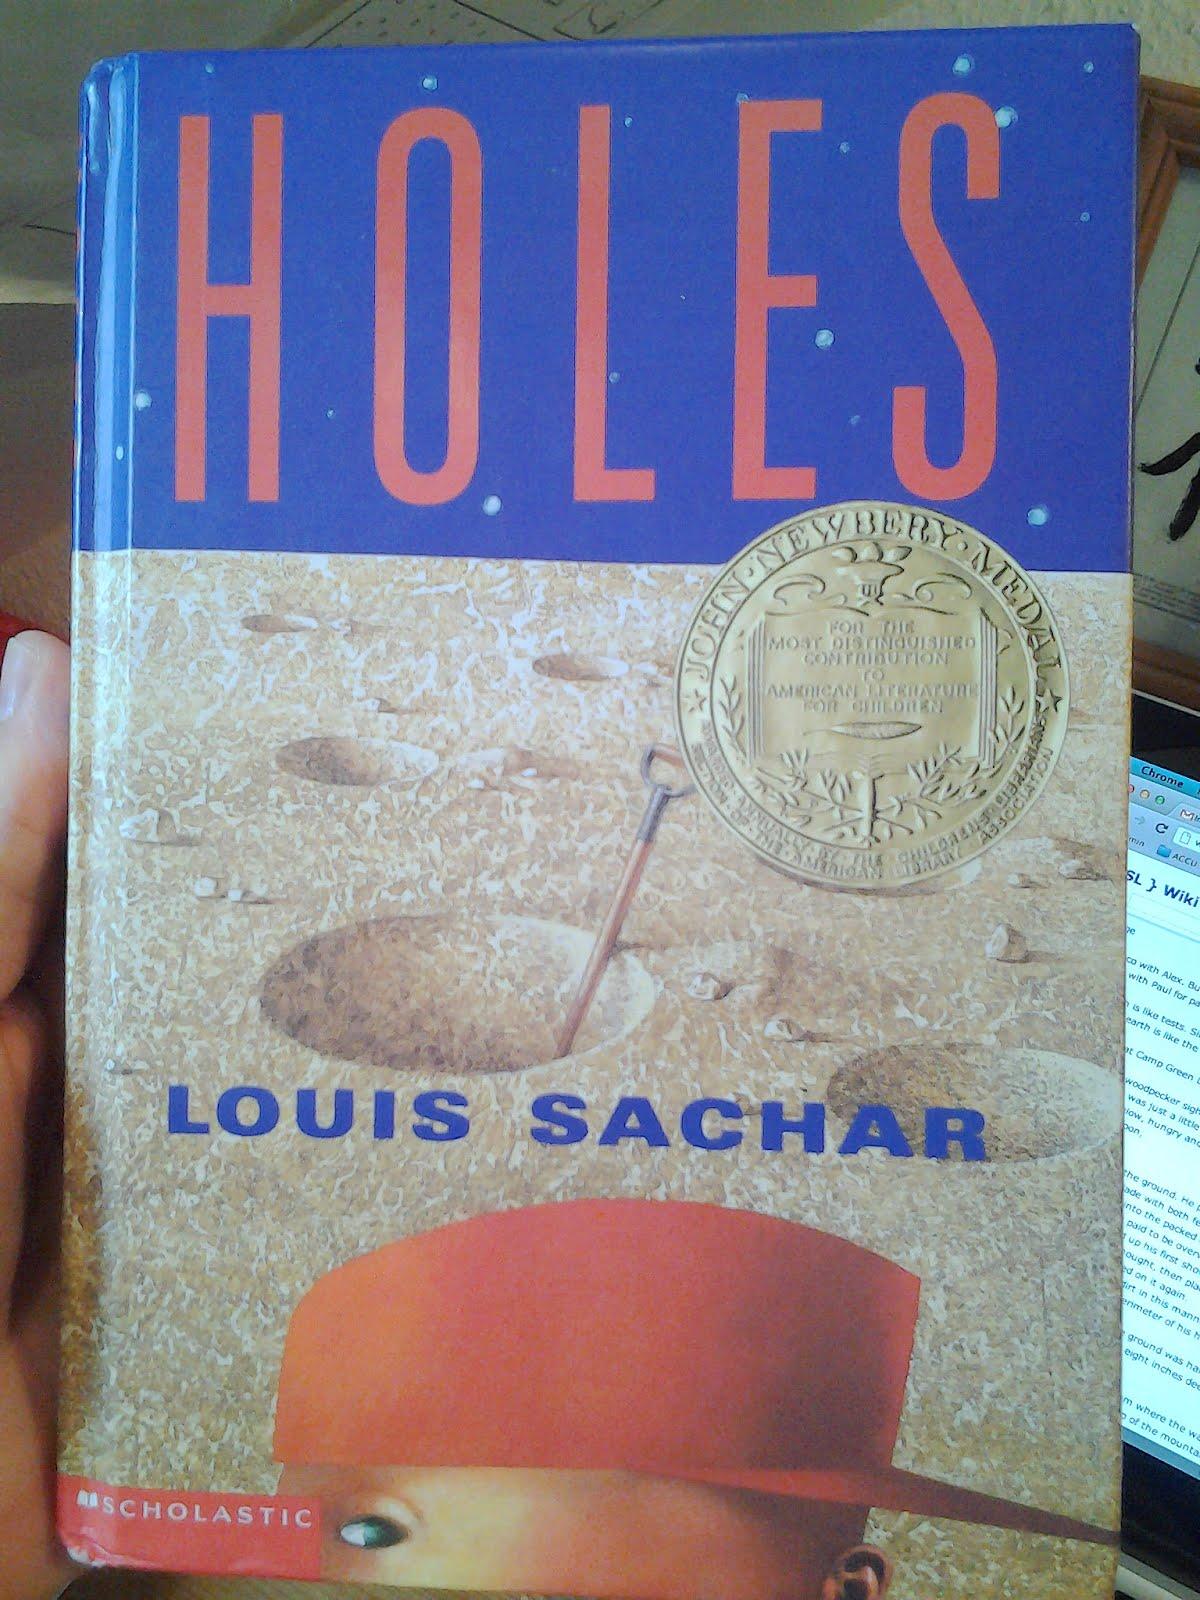 an examination of louis sachars book holes